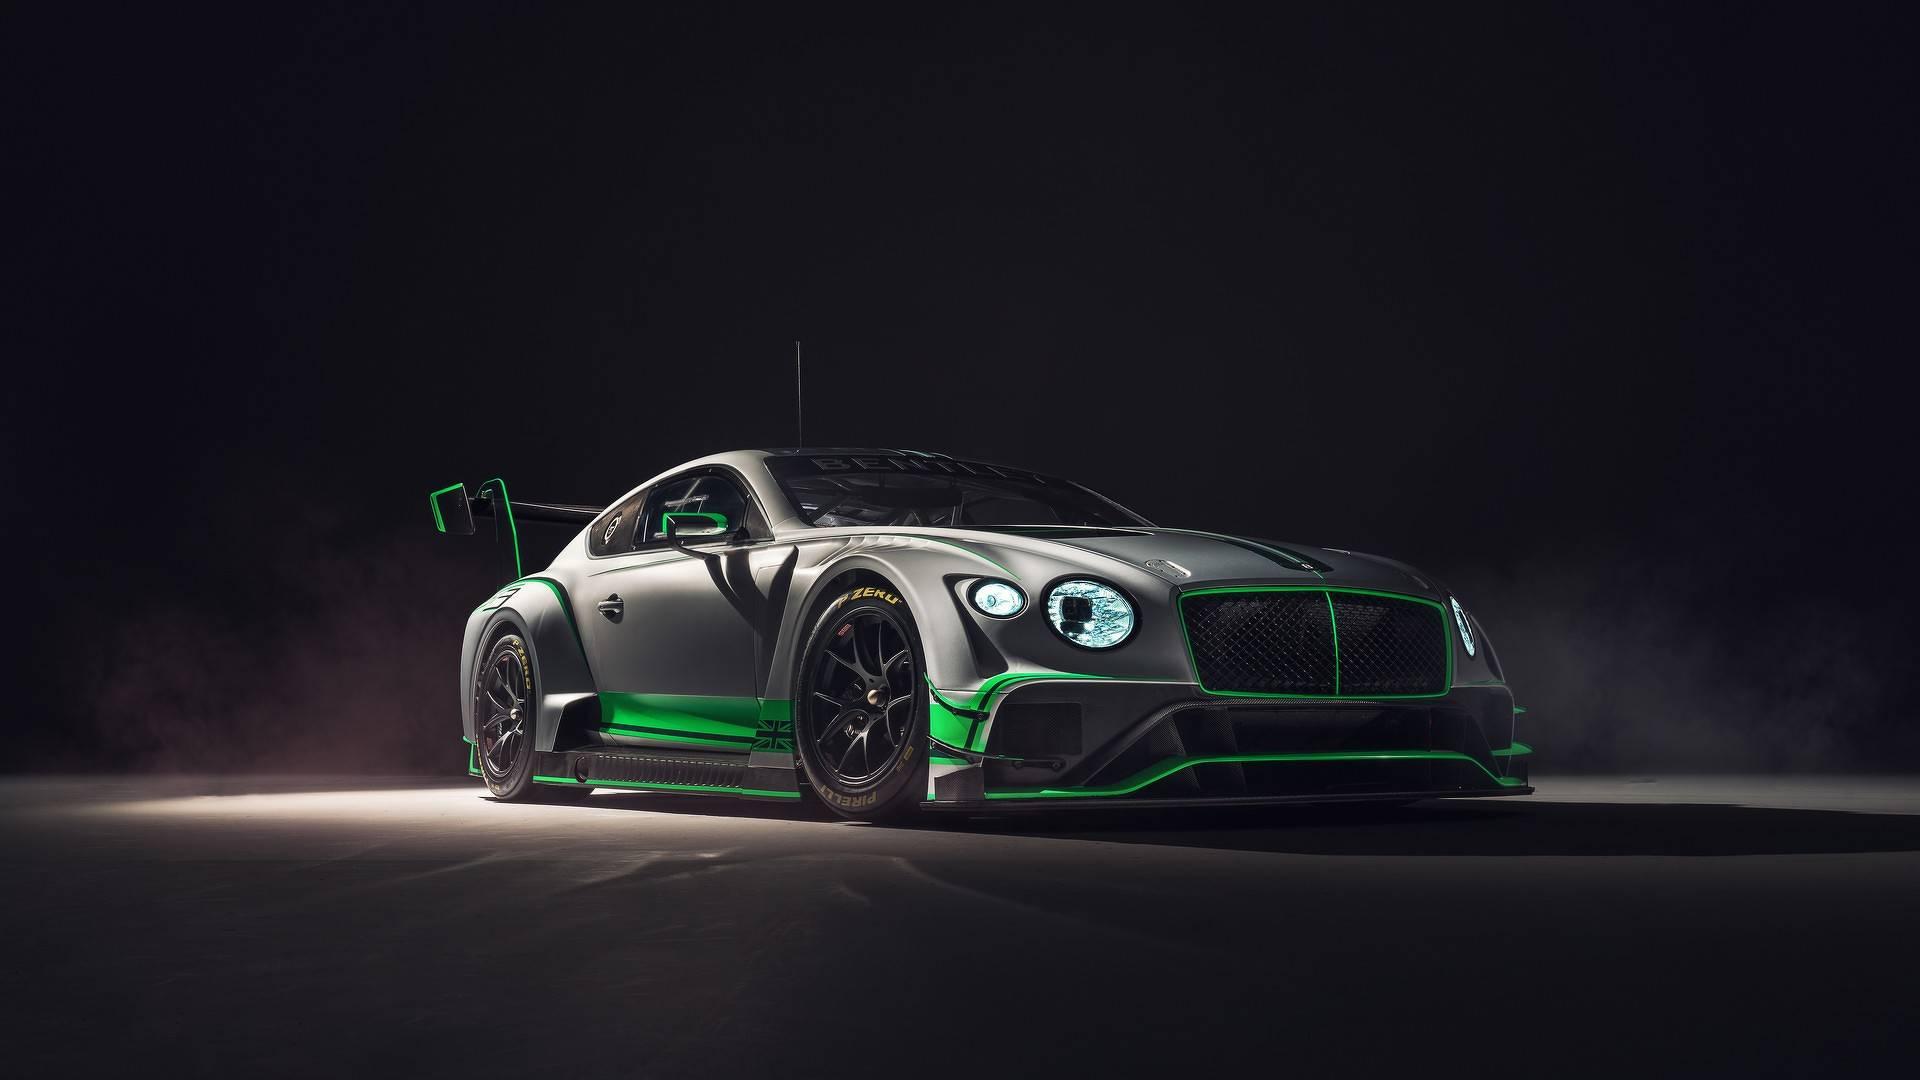 Permalink to Bentley Gt3 Race Car For Sale